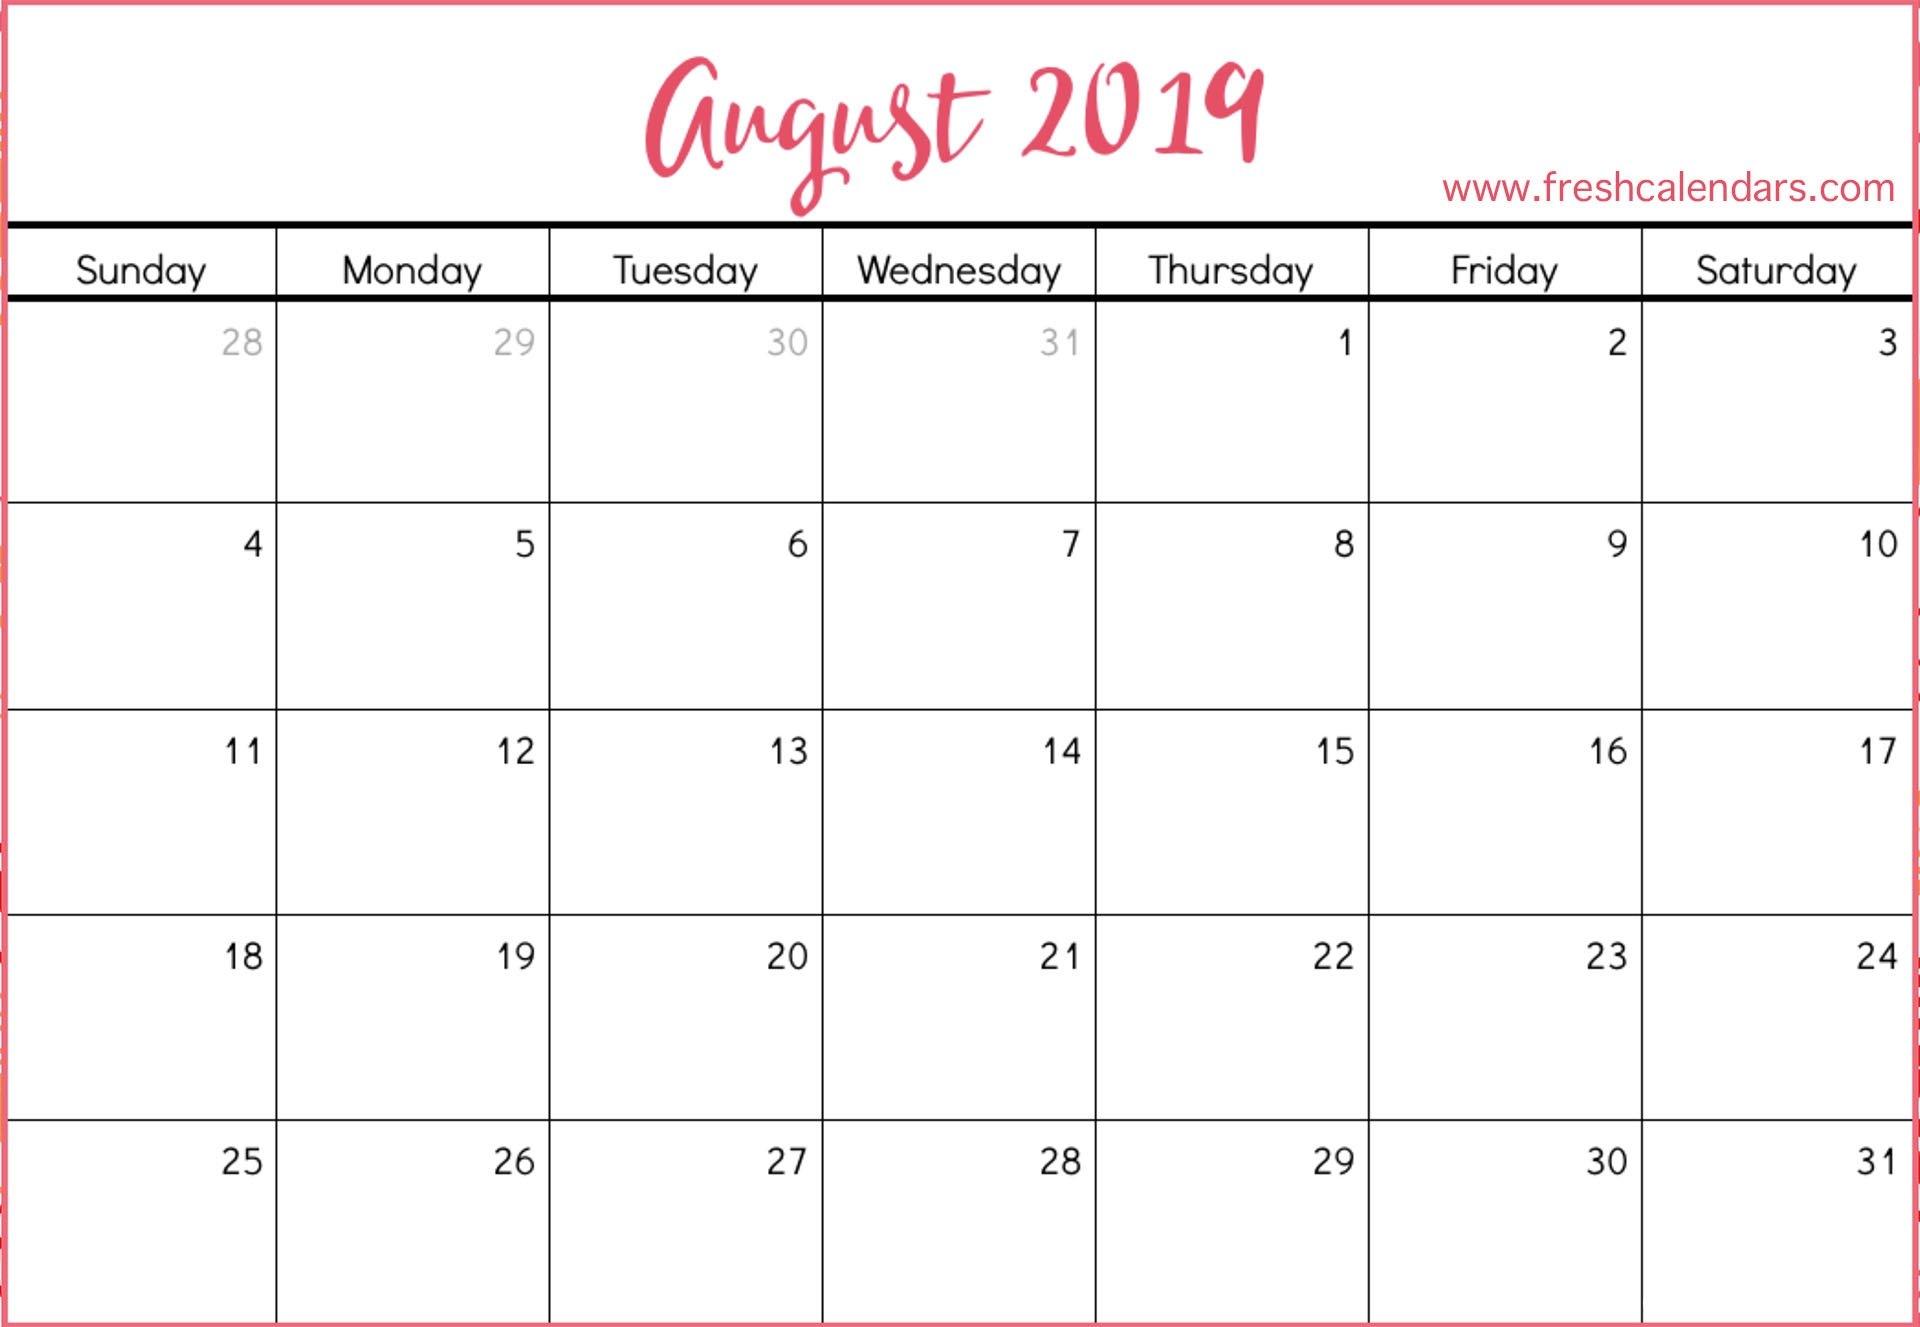 August 2019 Printable Calendars - Fresh Calendars 2019 Calendar 365 Pdf